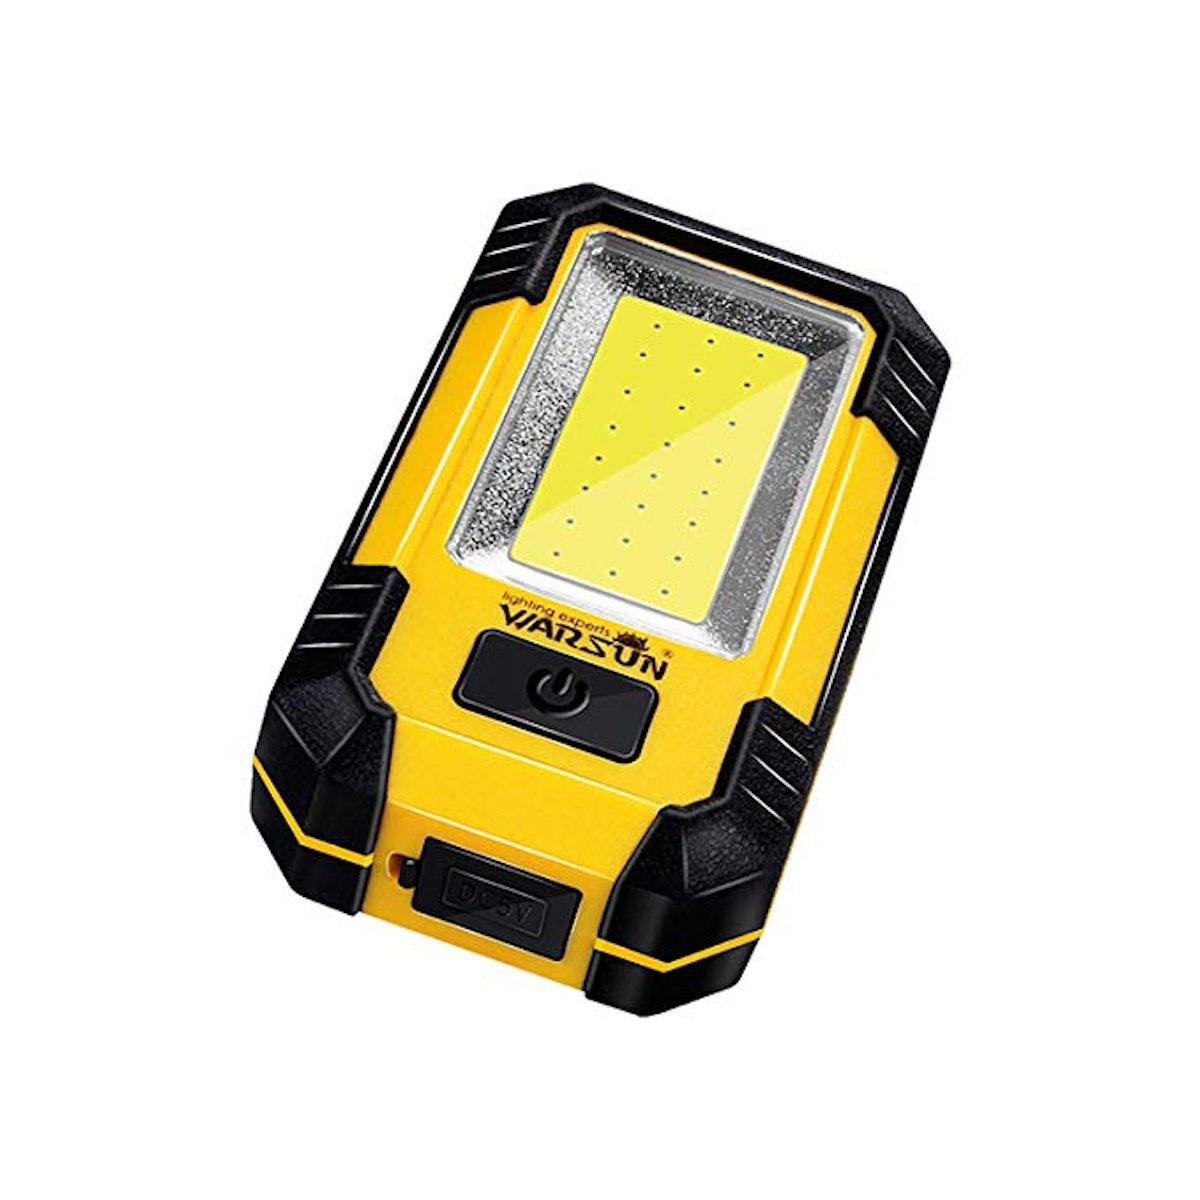 Warsun Portable LED Work Light